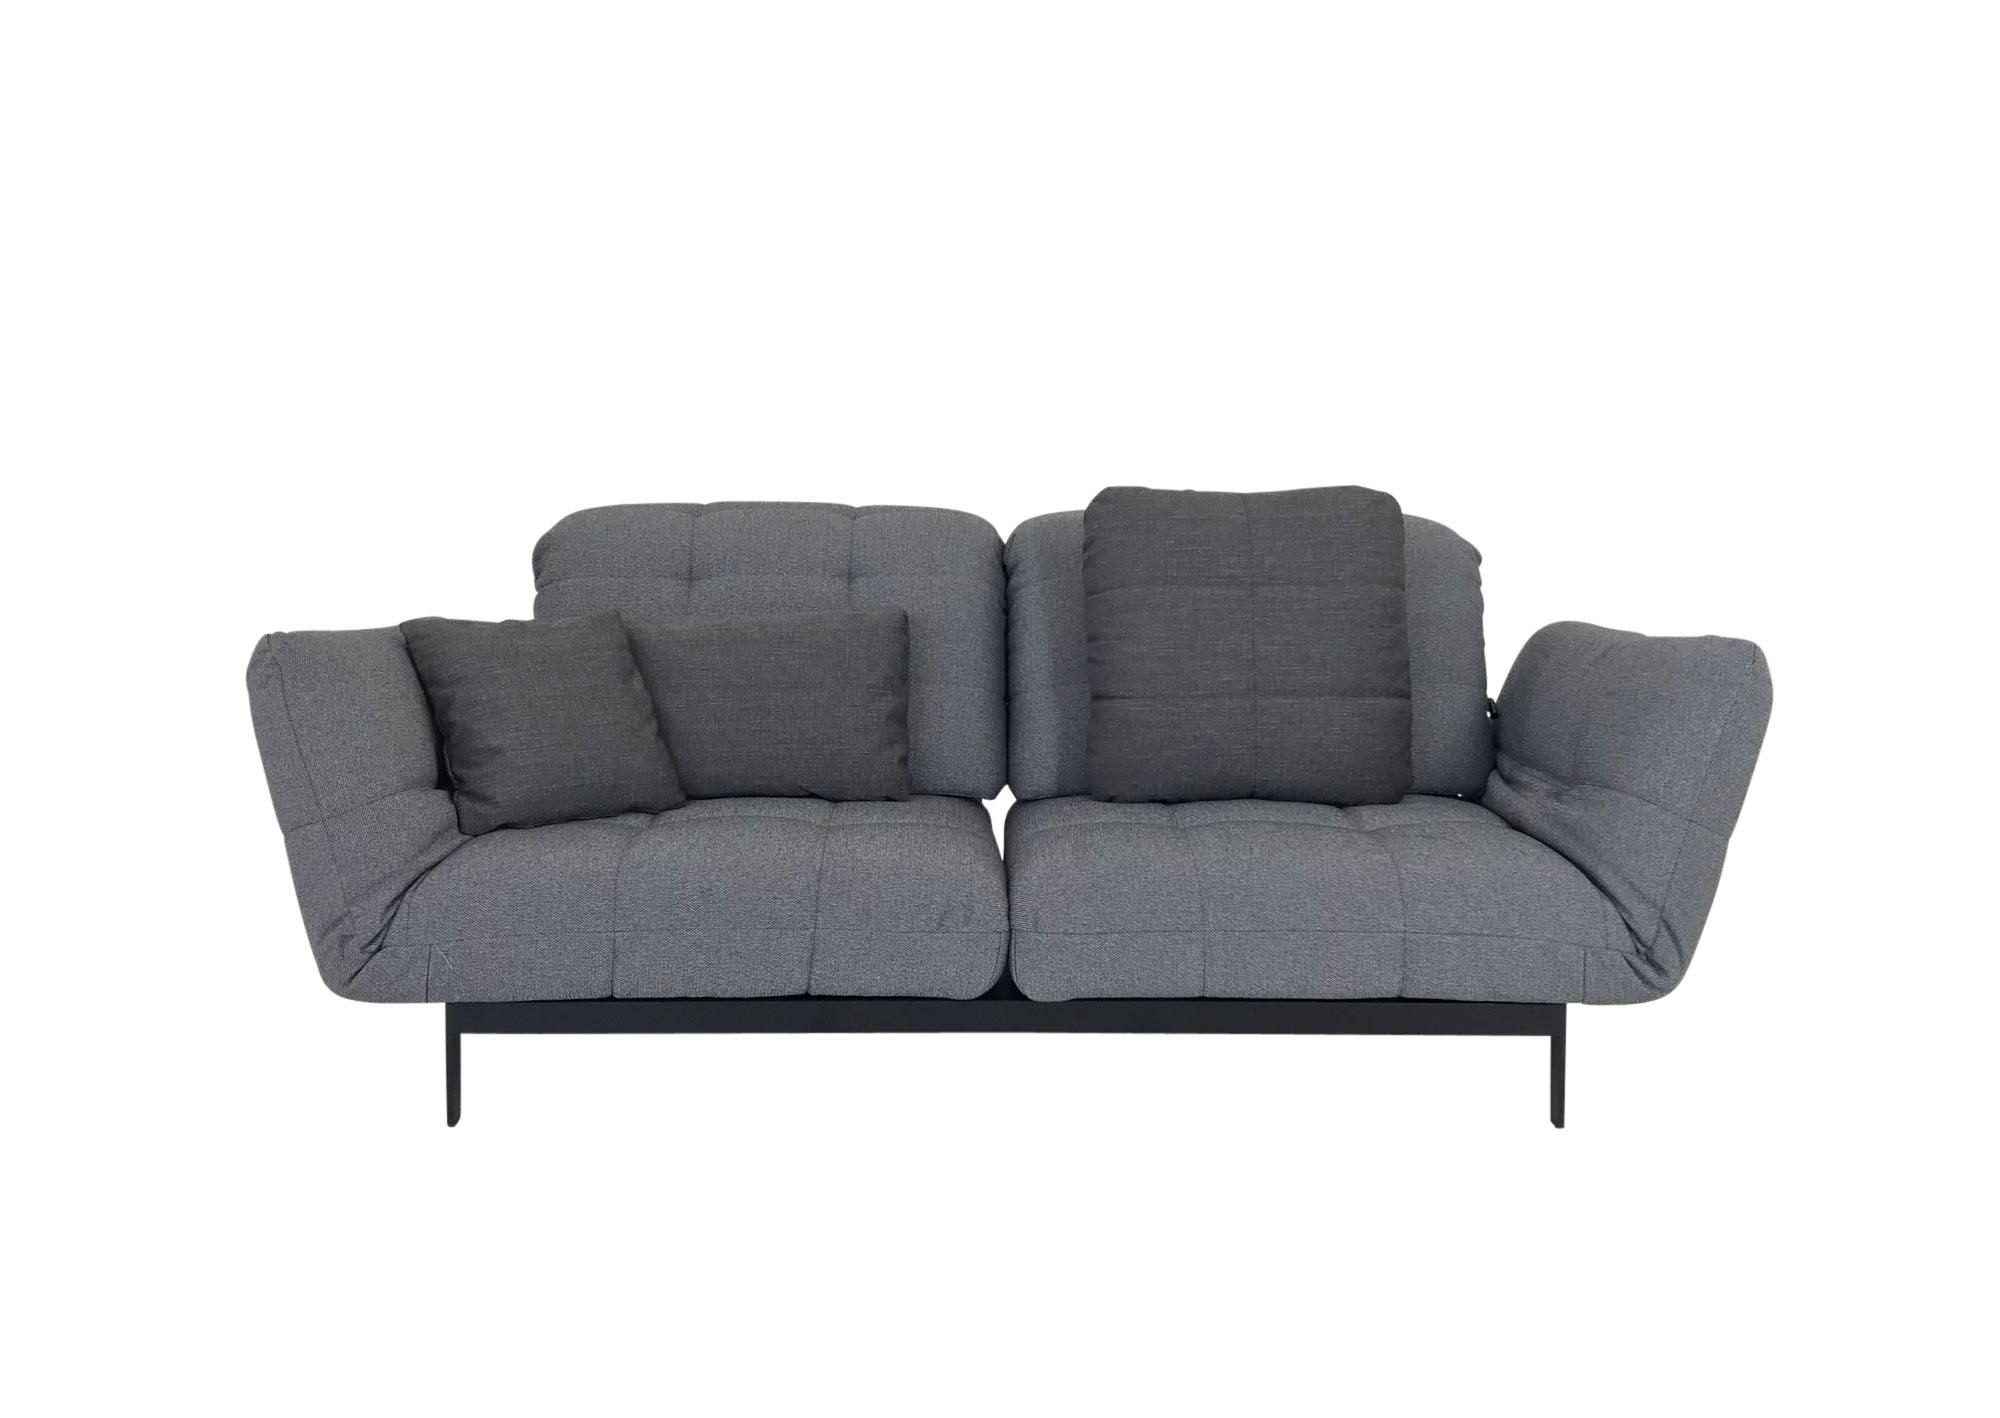 agio rolf benz sofas g nstig online kaufen. Black Bedroom Furniture Sets. Home Design Ideas